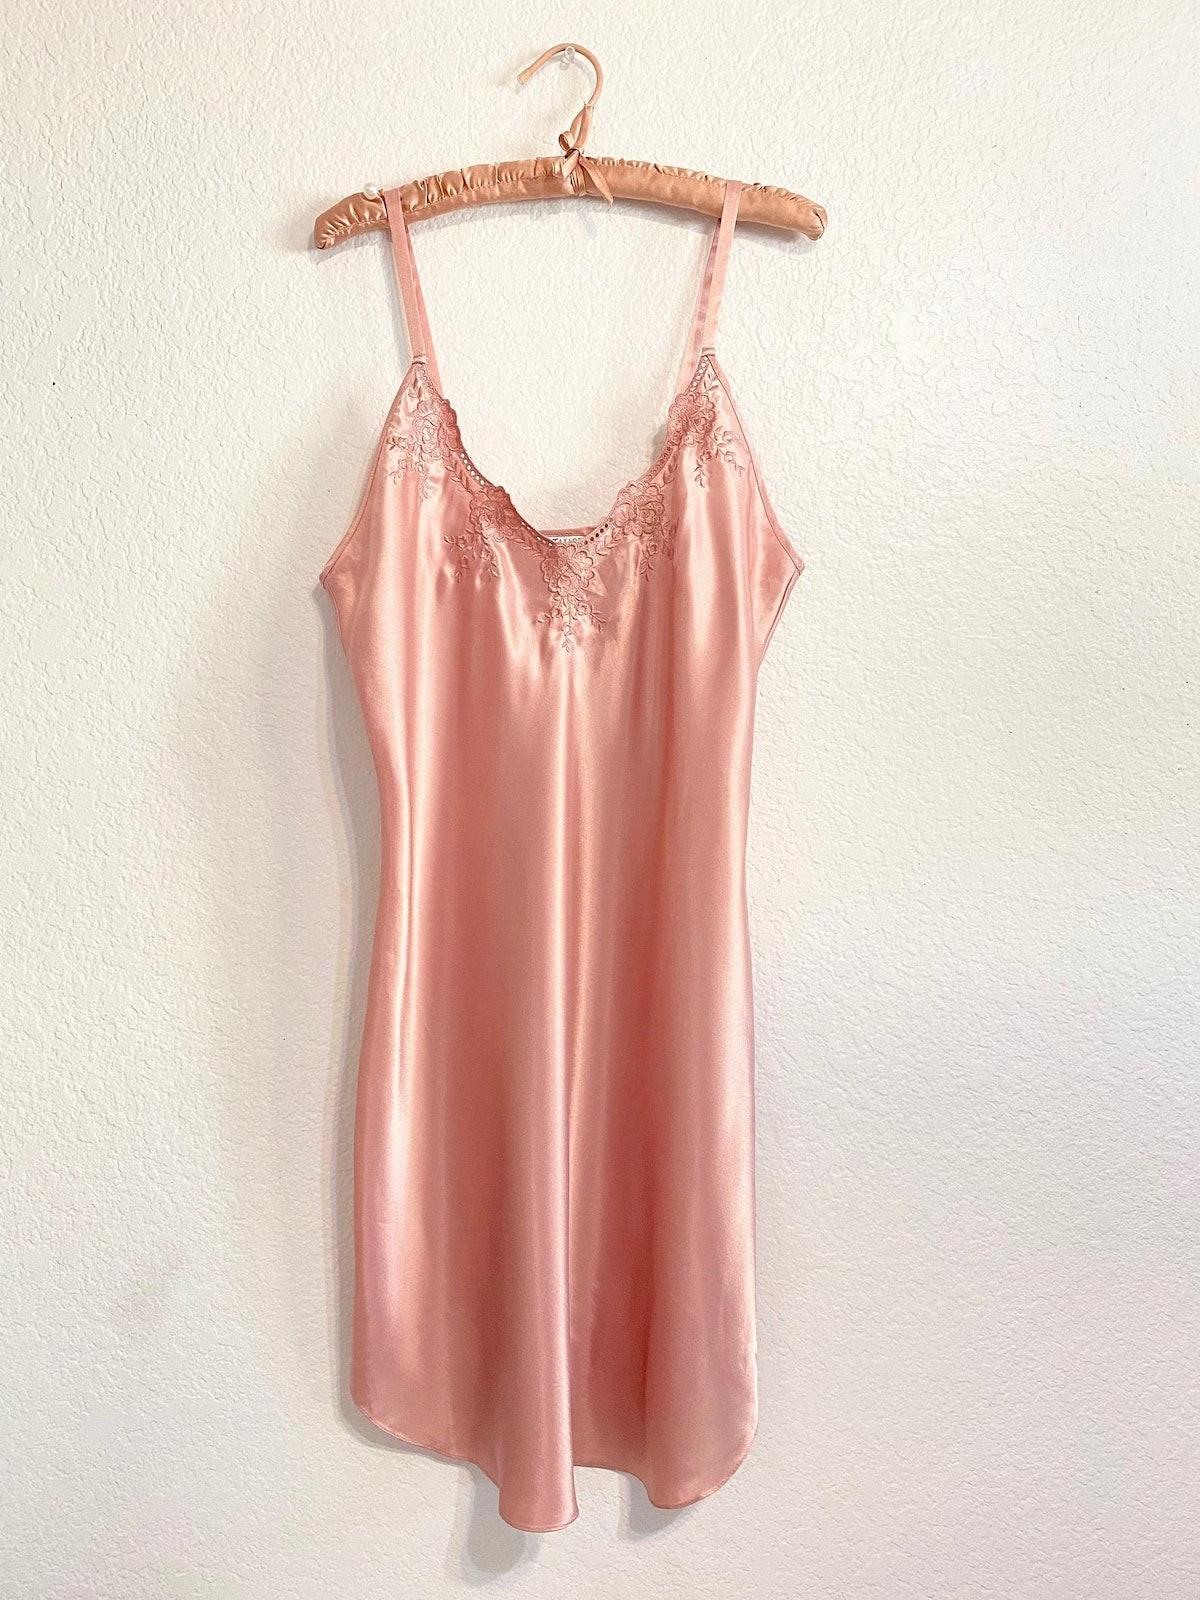 Vintage Erika Taylor Dusty Rose Slip Dress